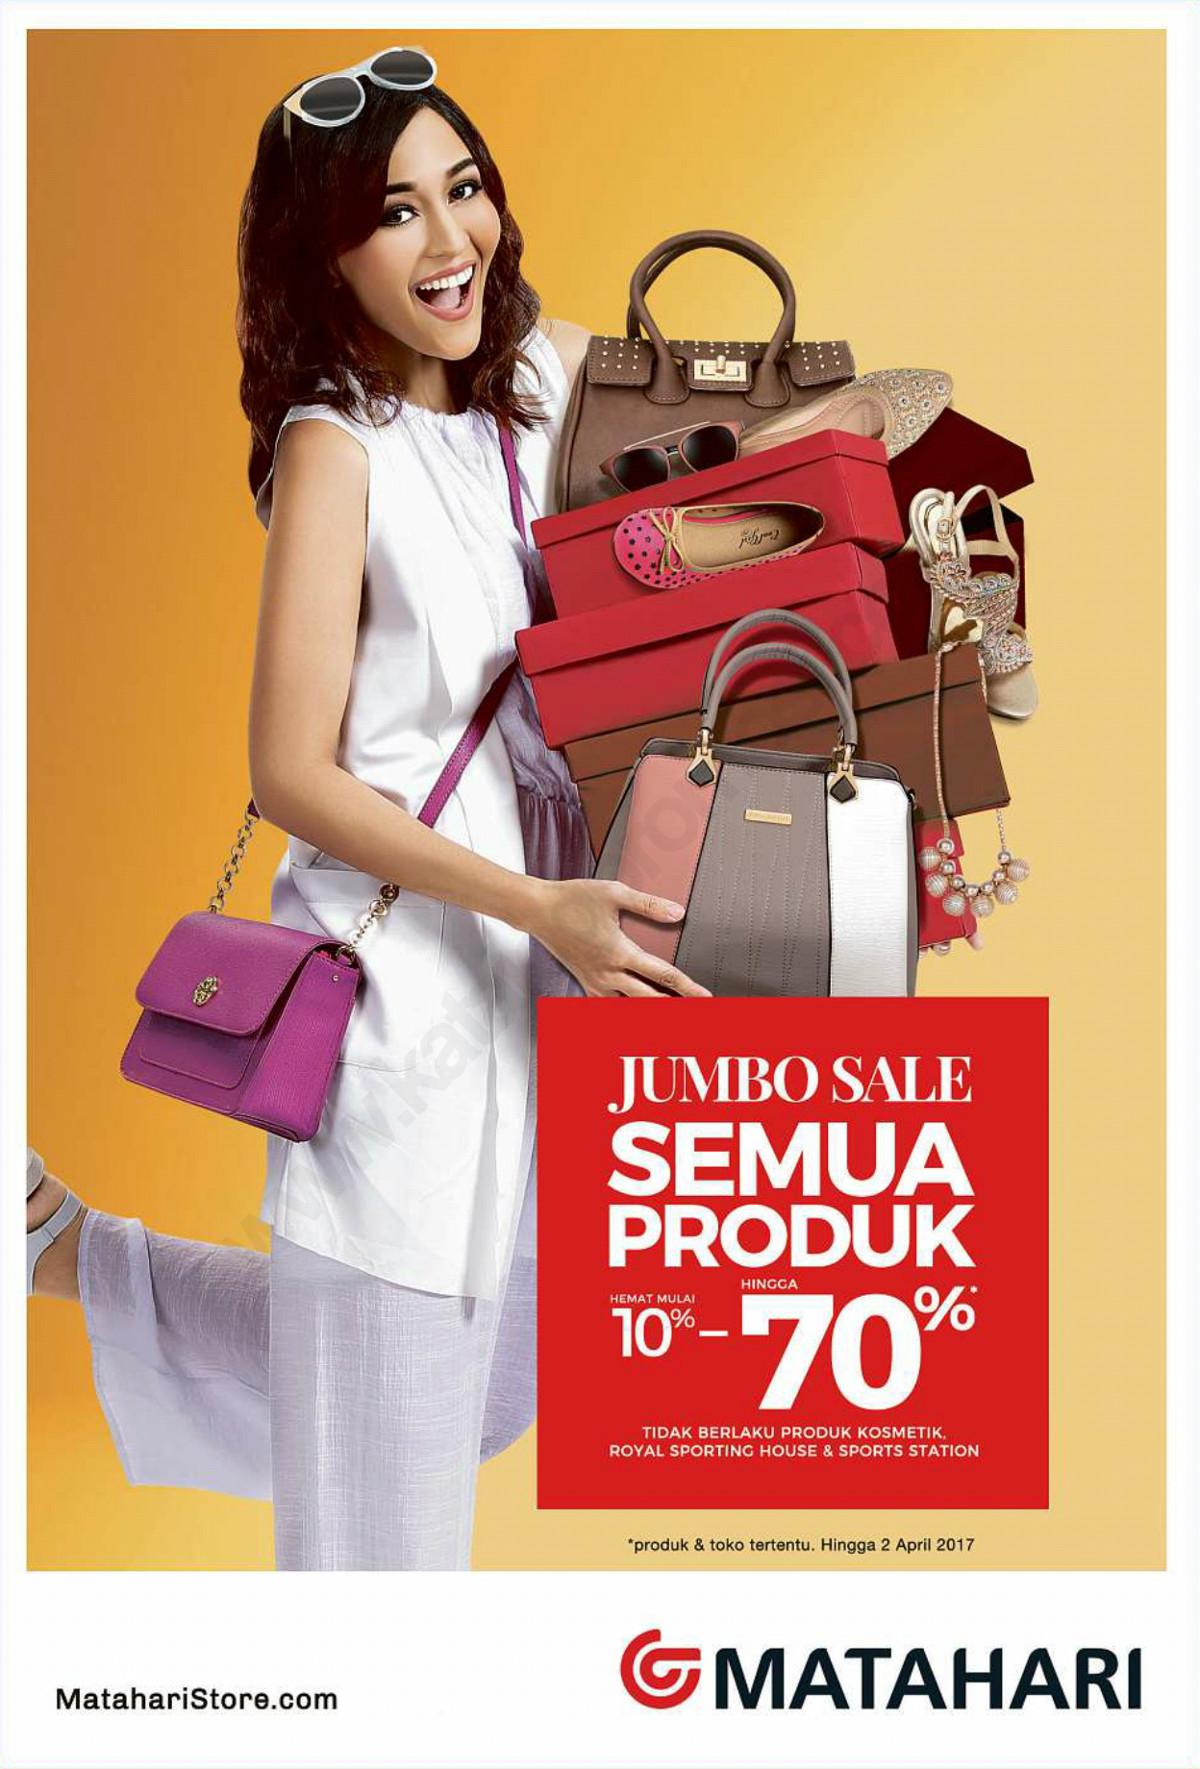 Promo MATAHARI Dept Store JUMBO SALE! Diskon 10% – 70% Semua Produk Hingga 2 April 2017